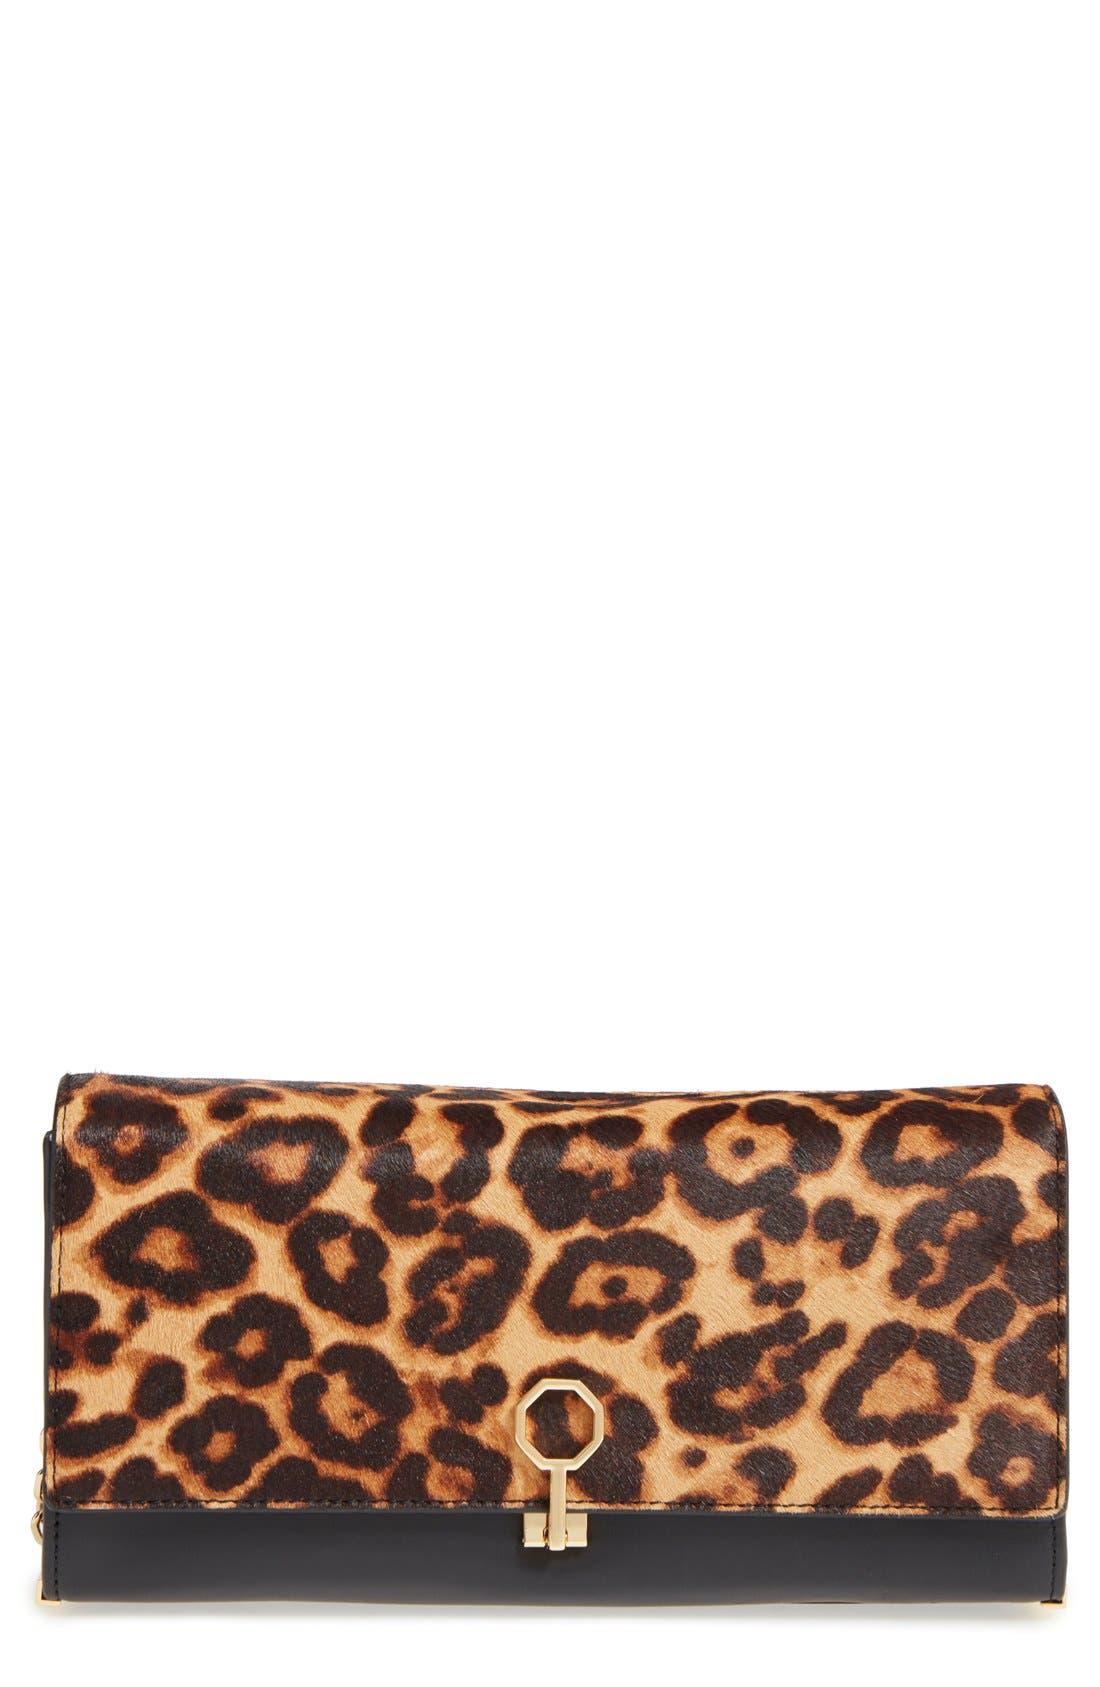 'Yvet' Leather & Genuine Calf Hair Clutch,                             Main thumbnail 1, color,                             200